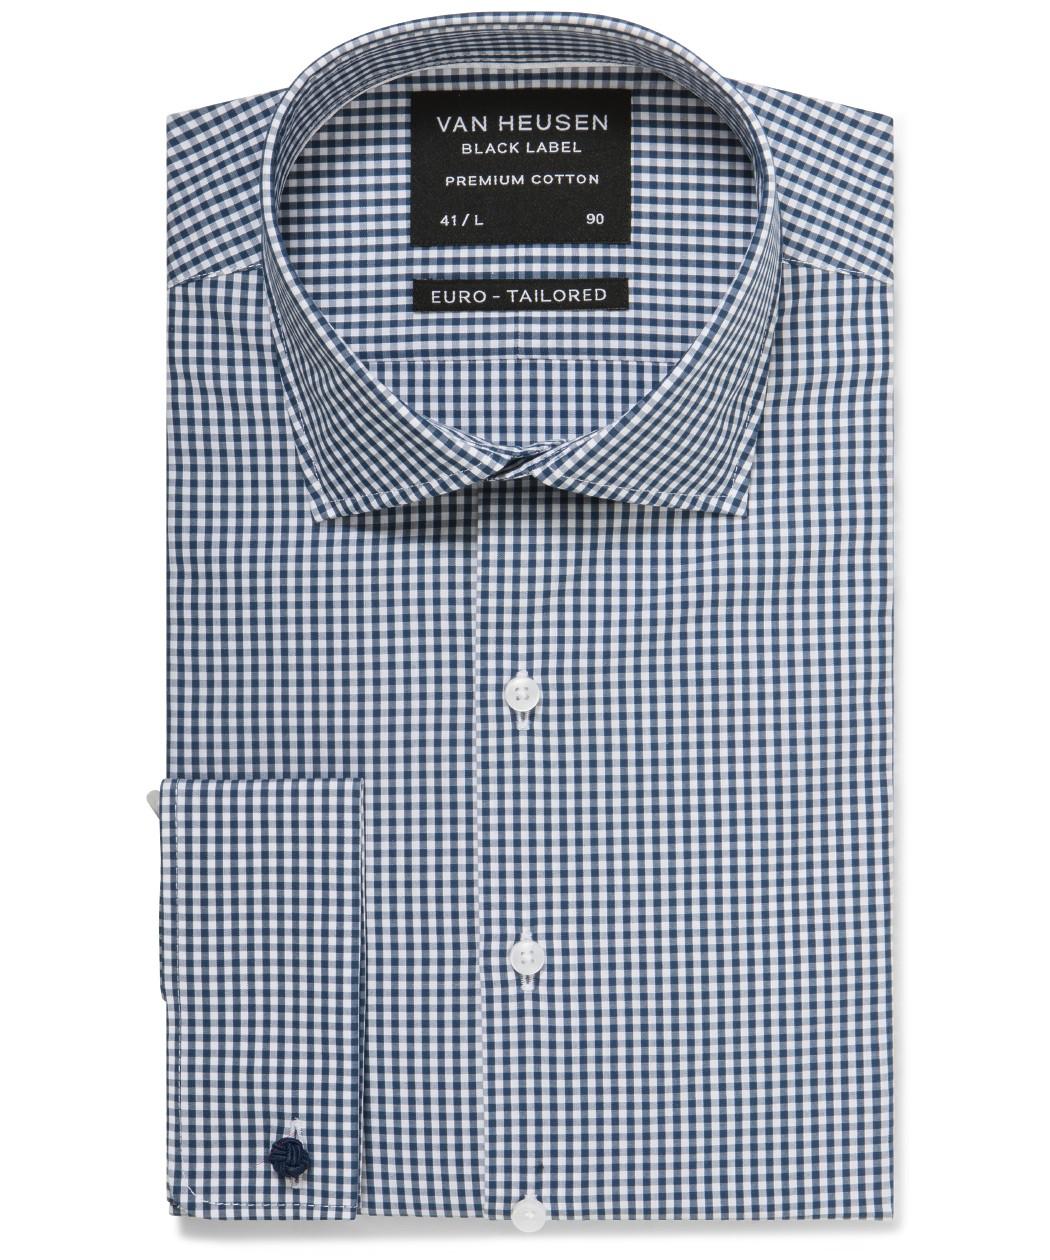 8845d42b08 Van Heusen. Black Label Euro Tailored Fit Shirt Navy Gingham